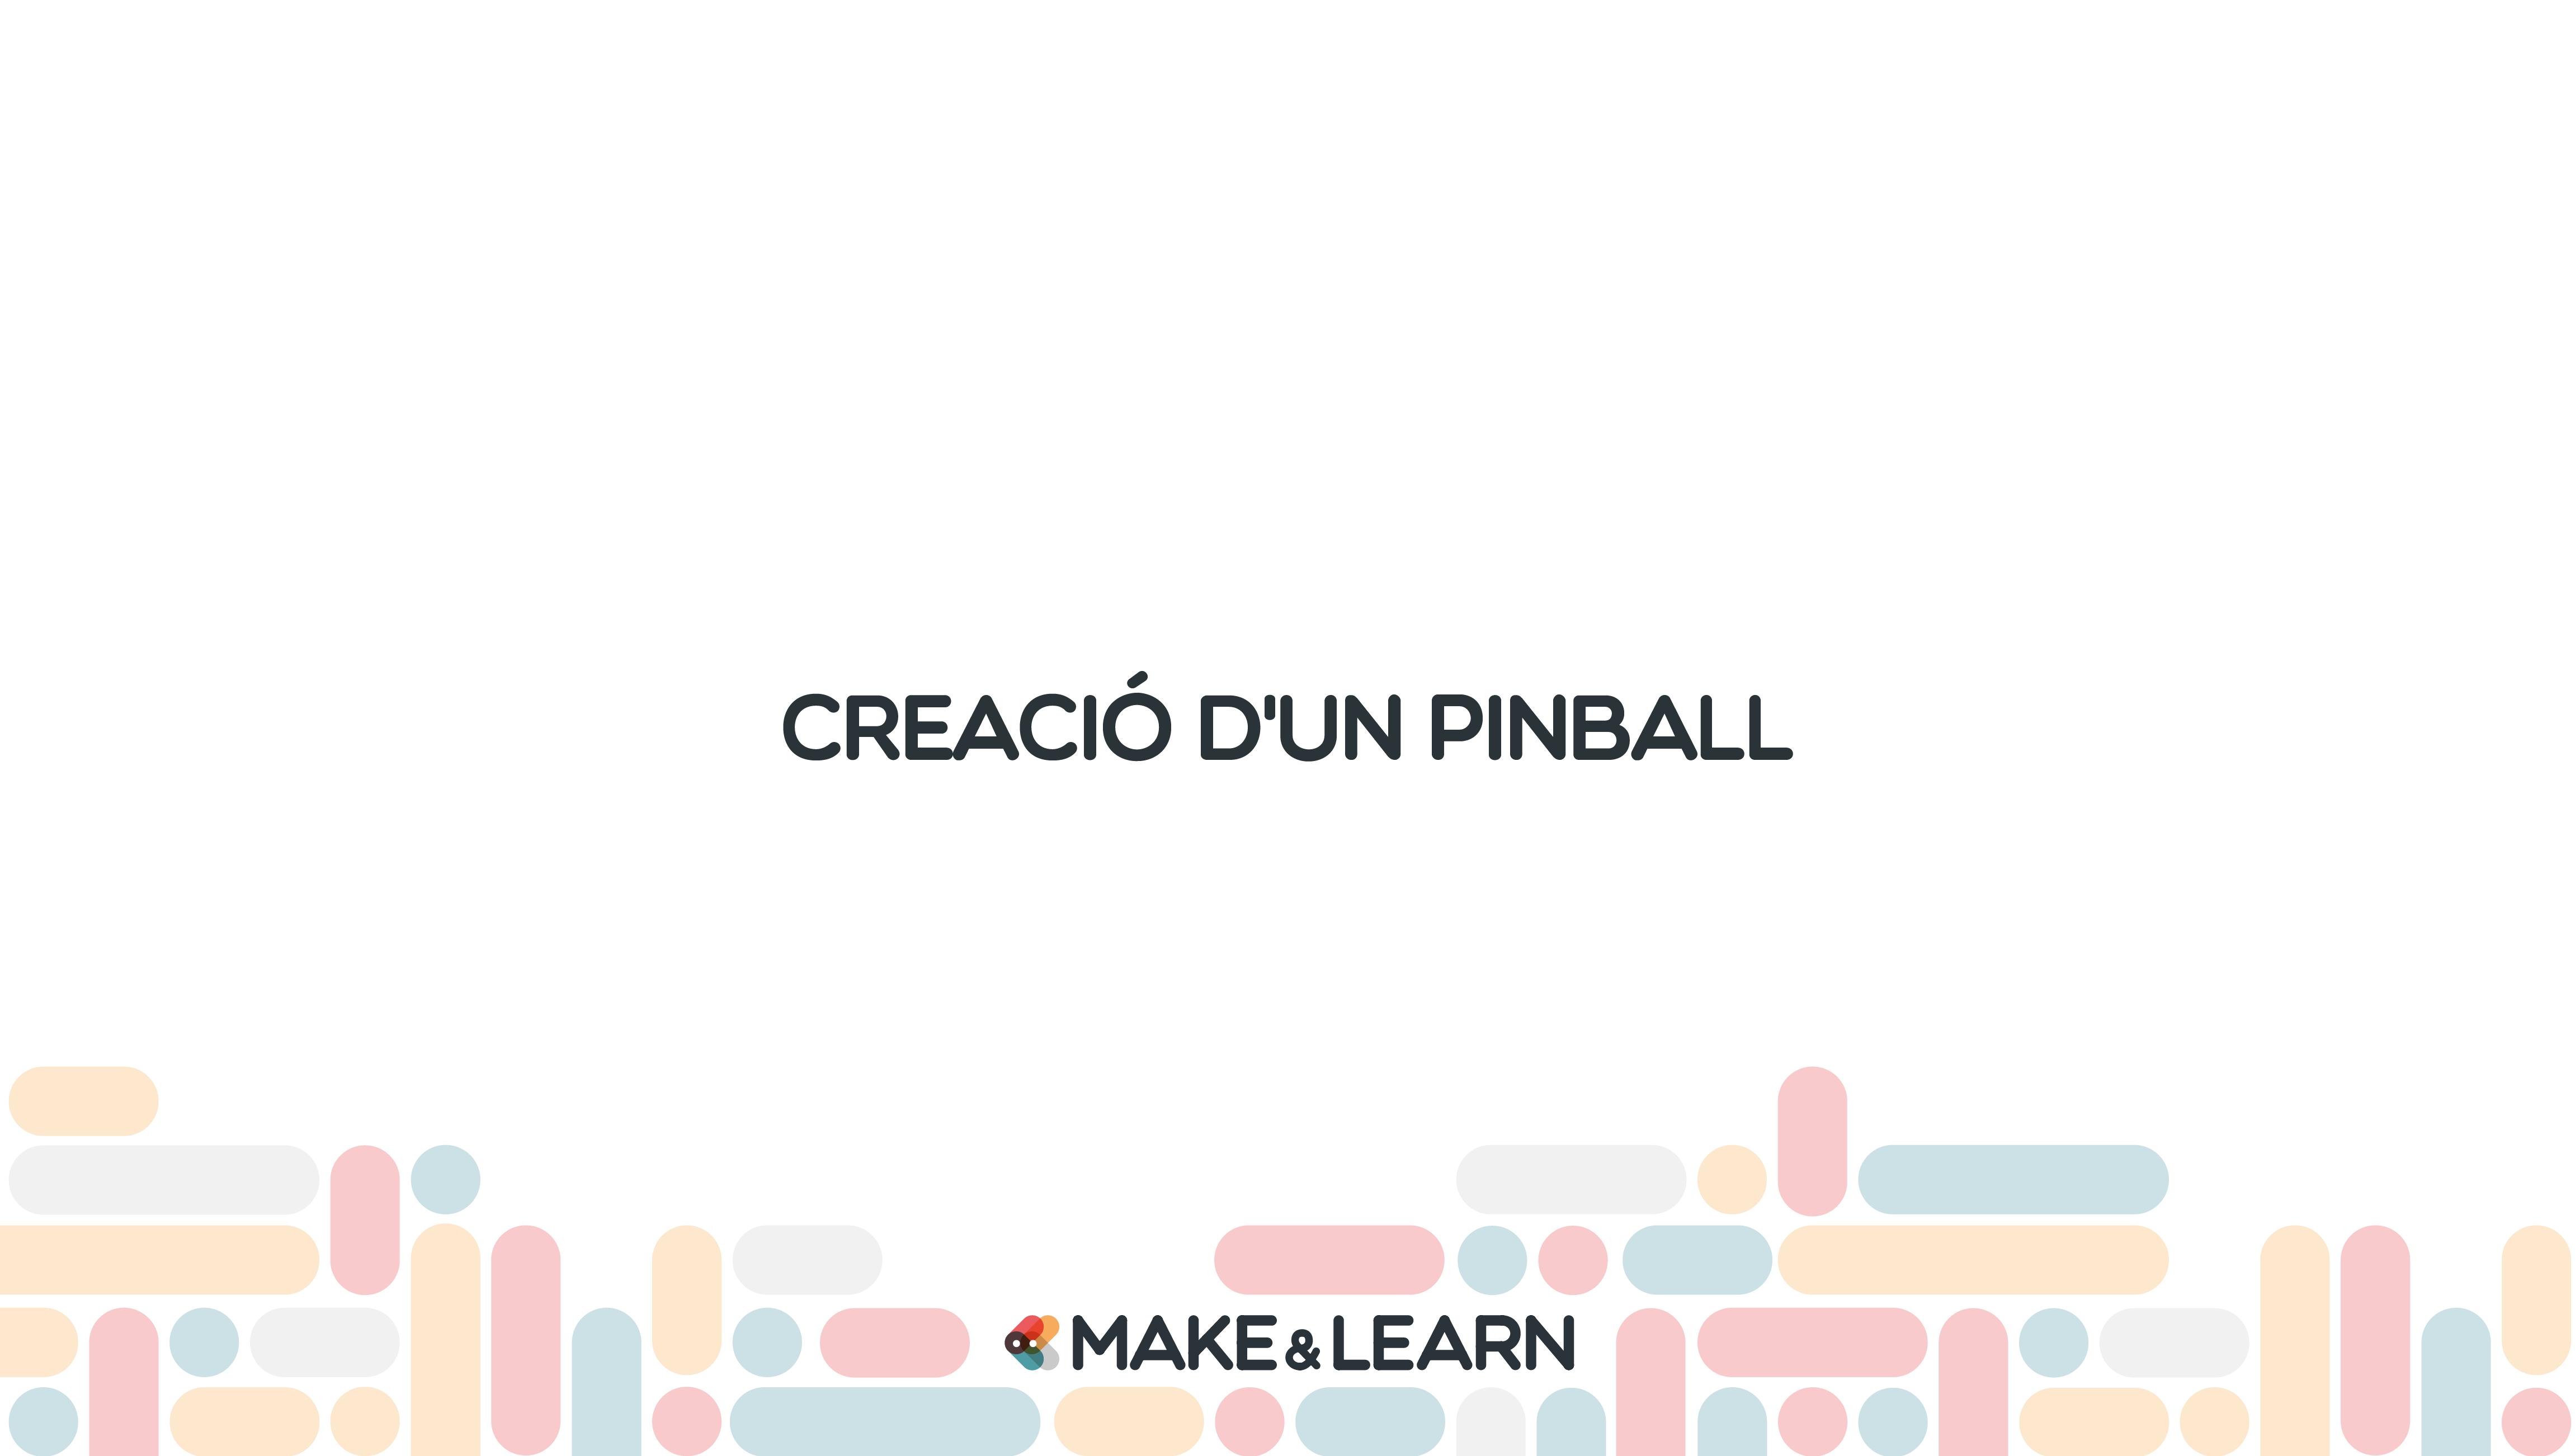 Creació d'un pinball